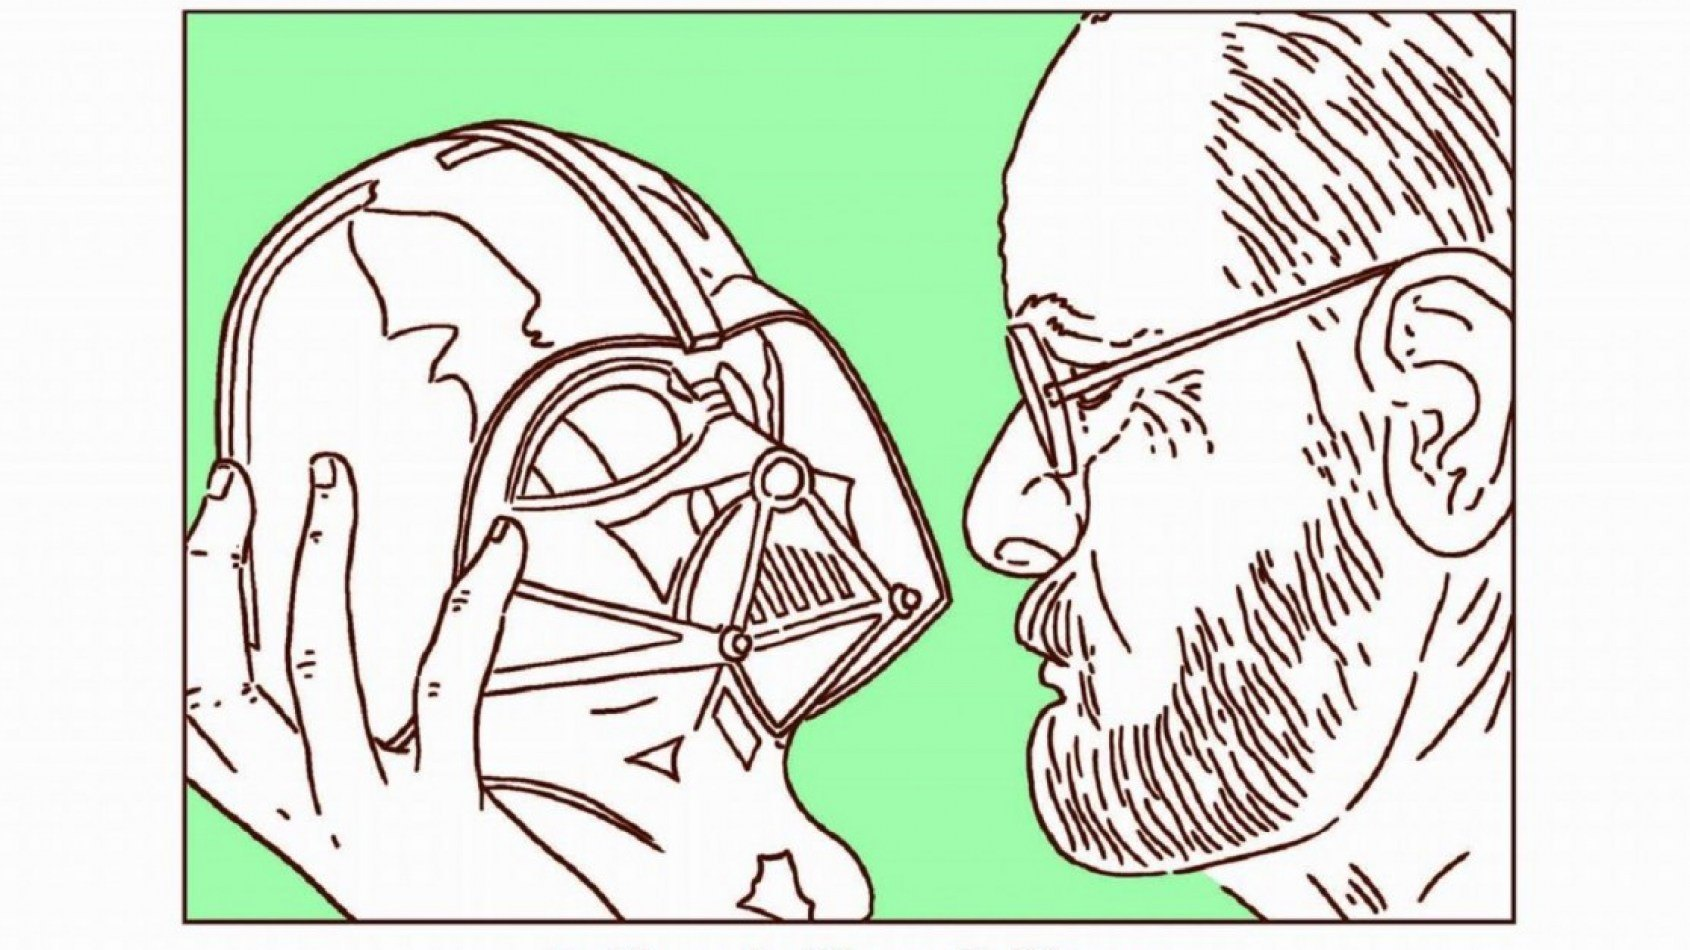 [Review] Star Wars Un Mythe Familial d'Arthur Leroy